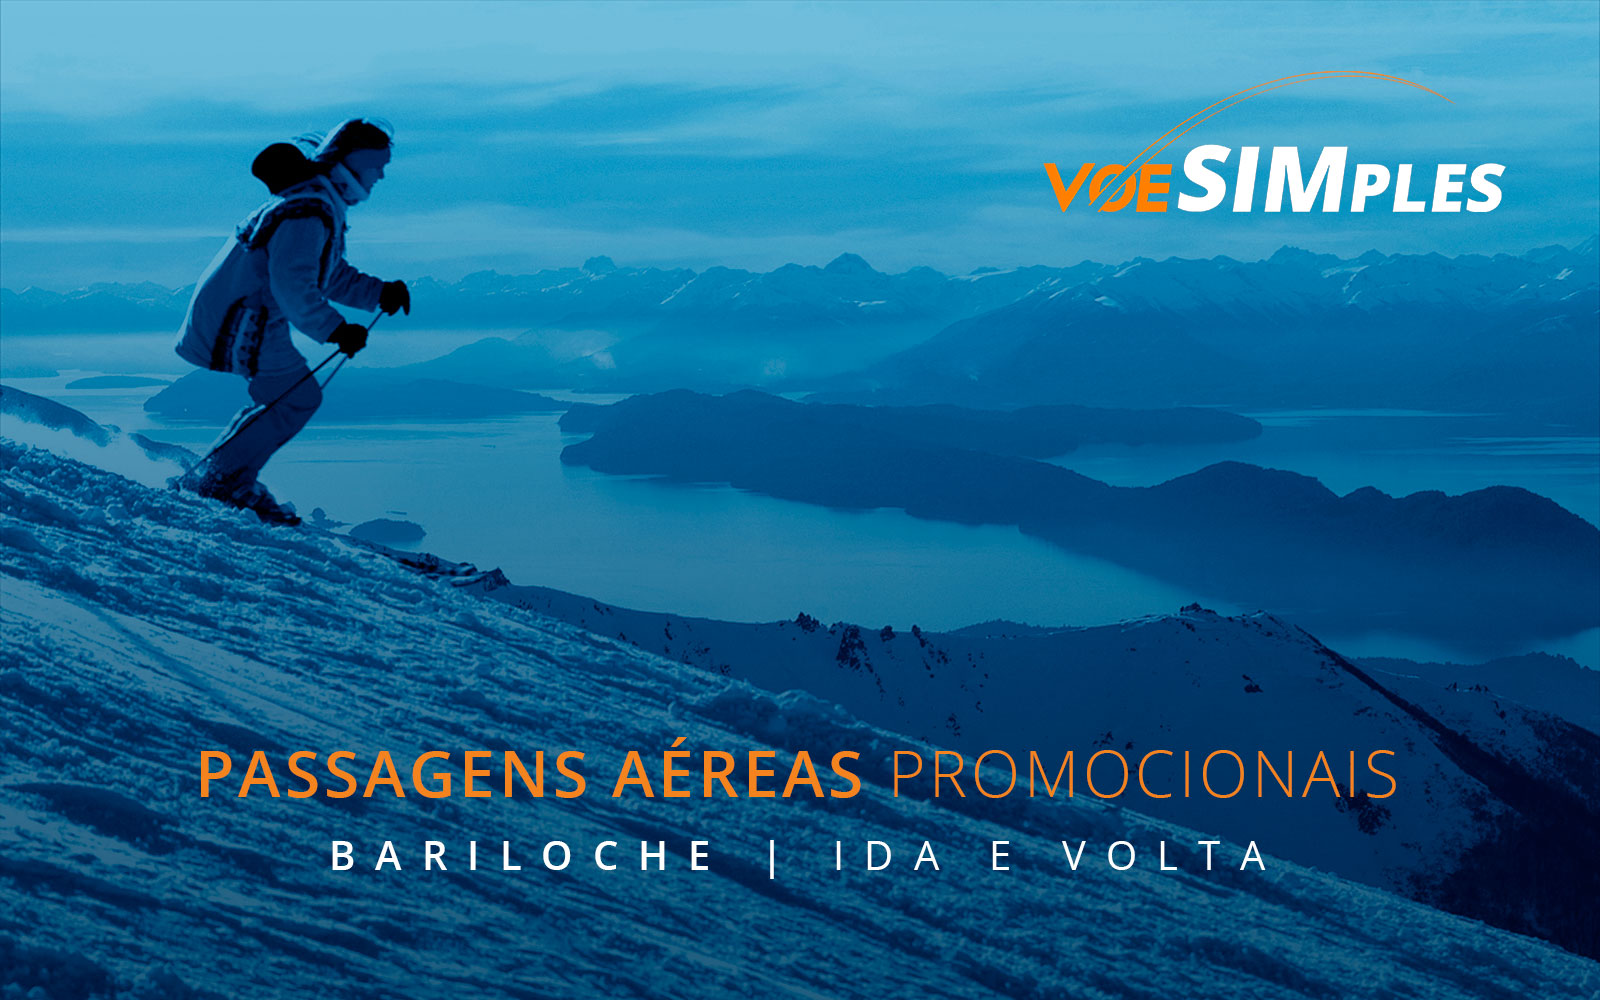 passagens-aereas-promocionais-ida-volta-argentina-voe-simples-passagens-aereas-baratas-promocao-bariloche